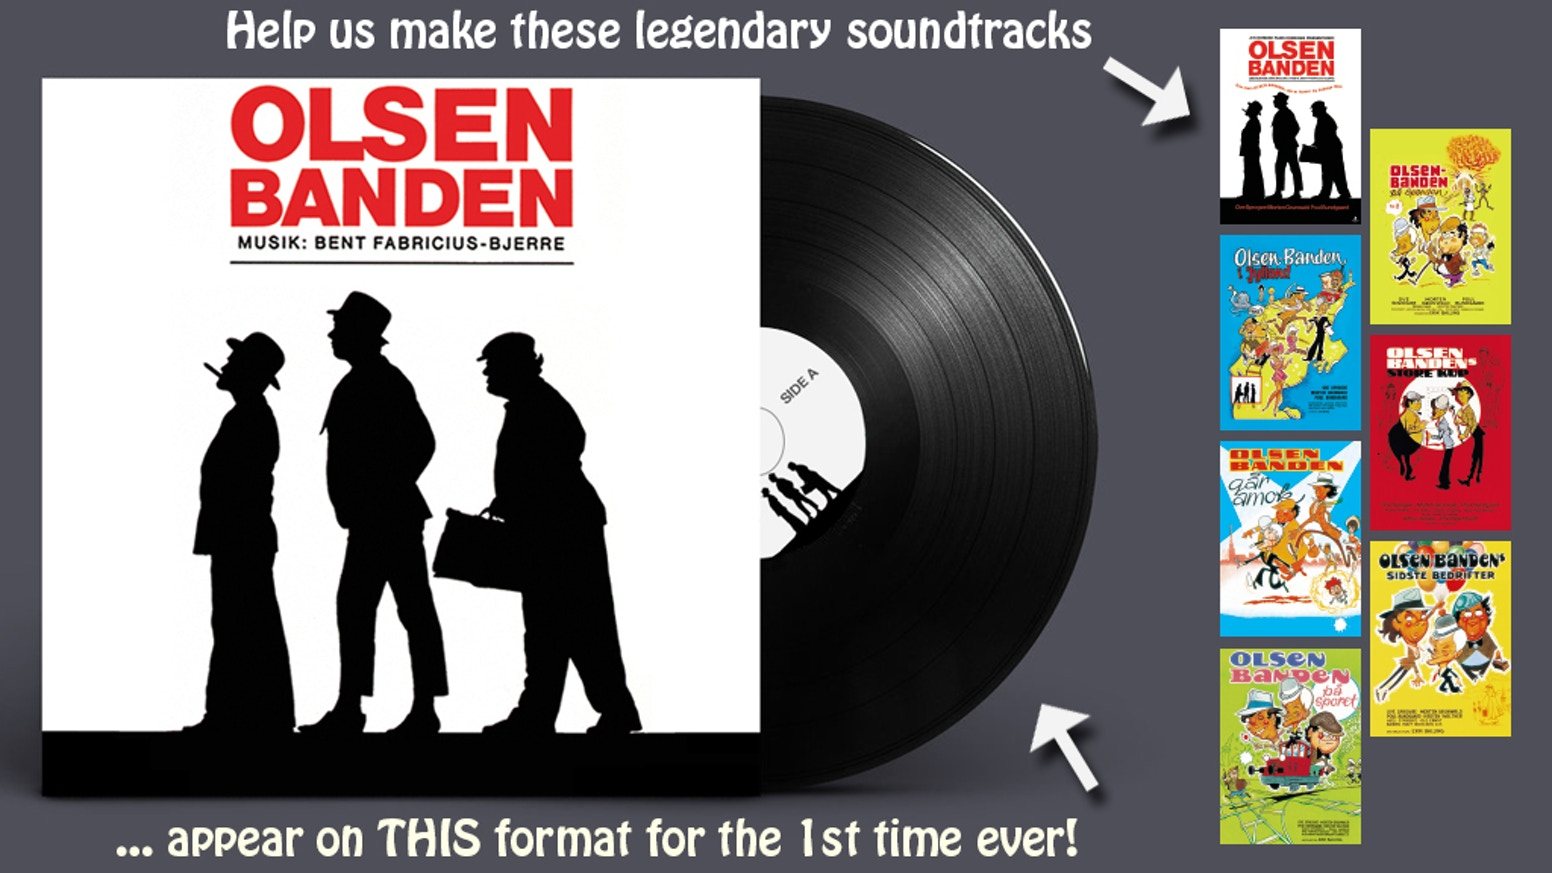 Olsen Banden Vinyl Best Of Vol 1 Soundtrack Release By